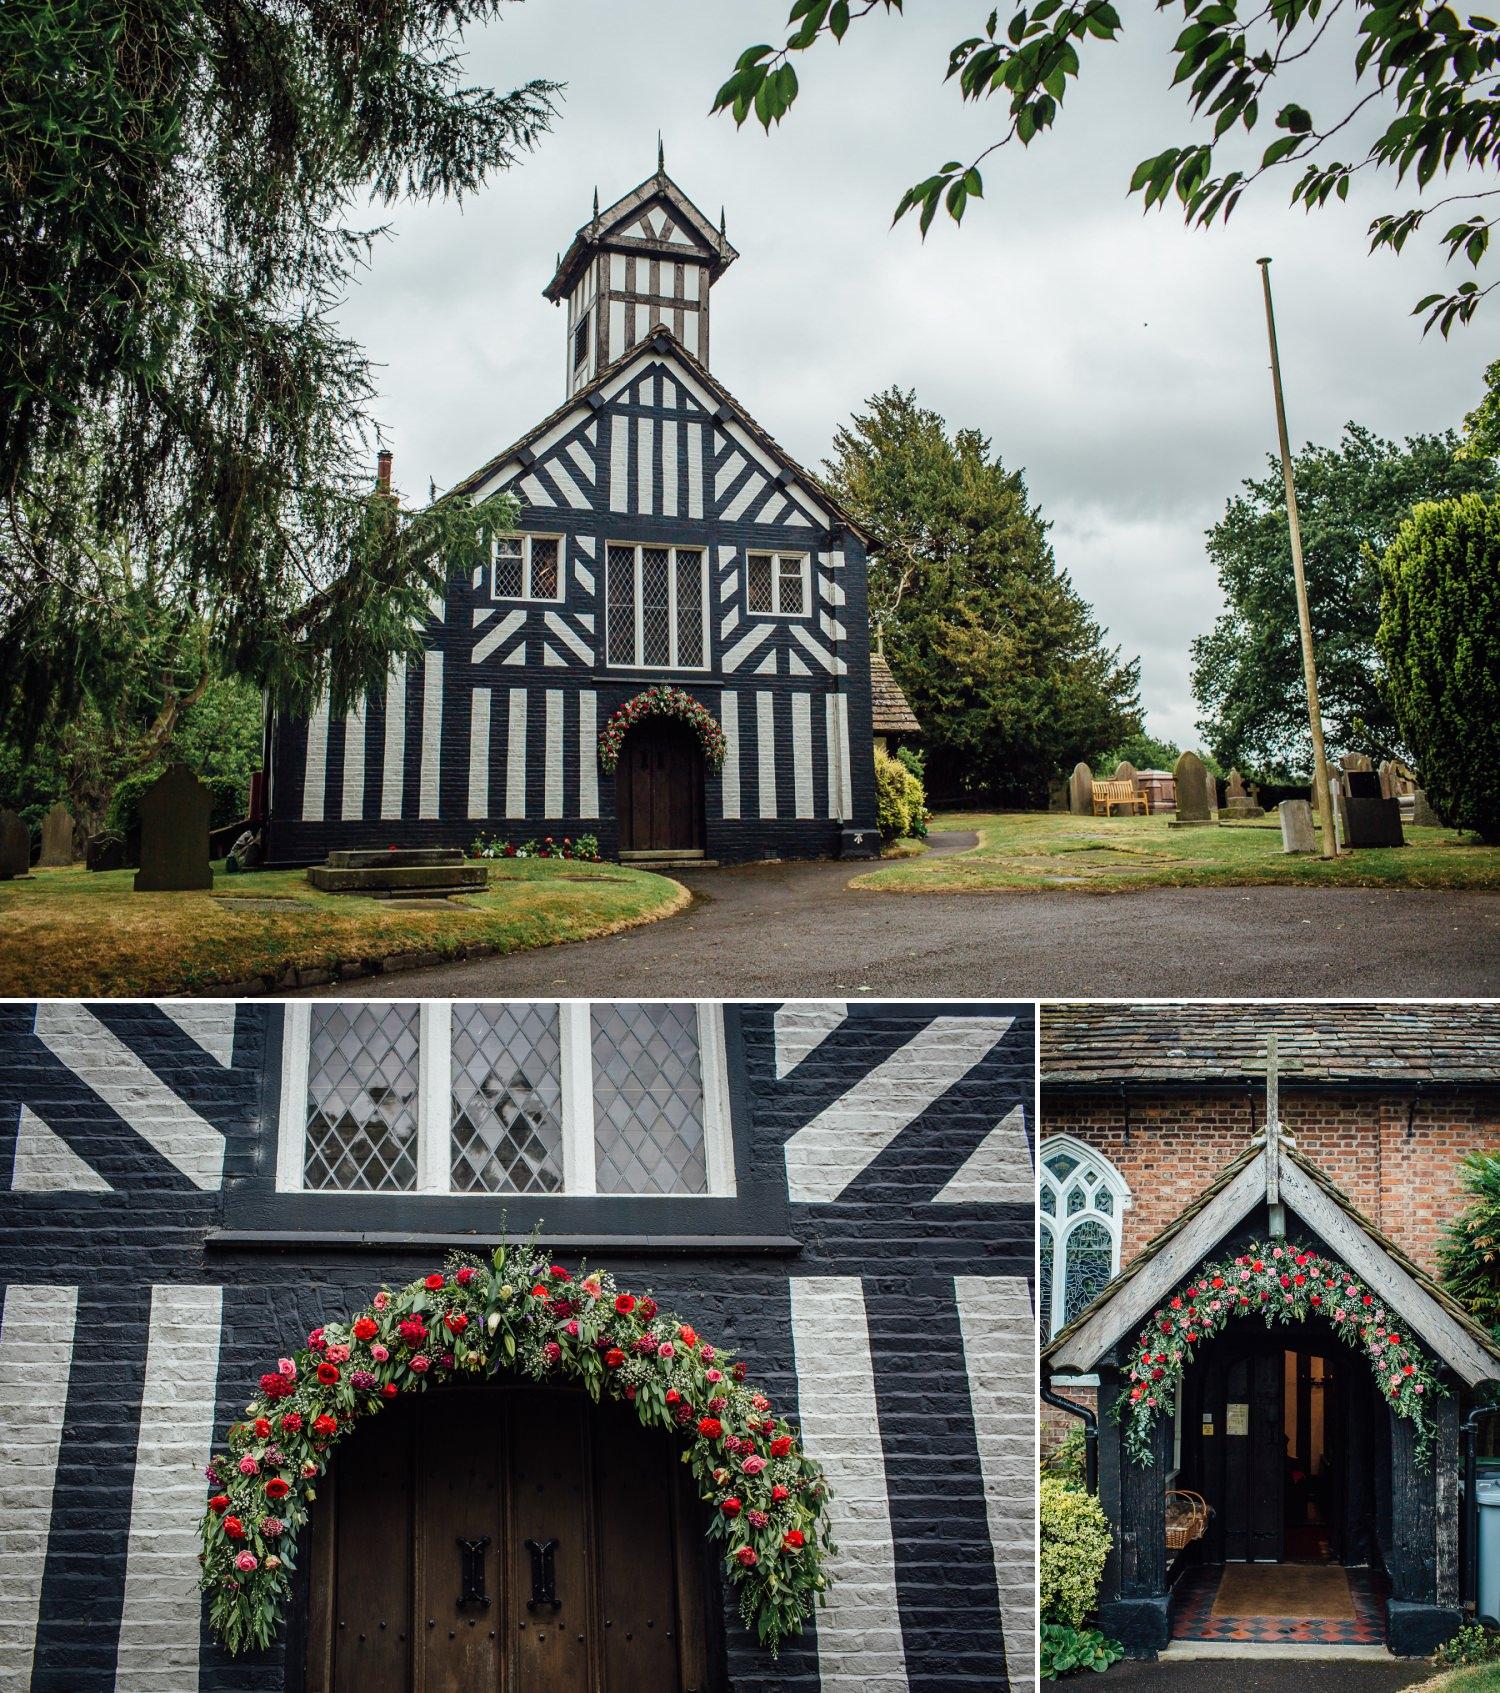 Siddington Church, Macclesfield wedding photo